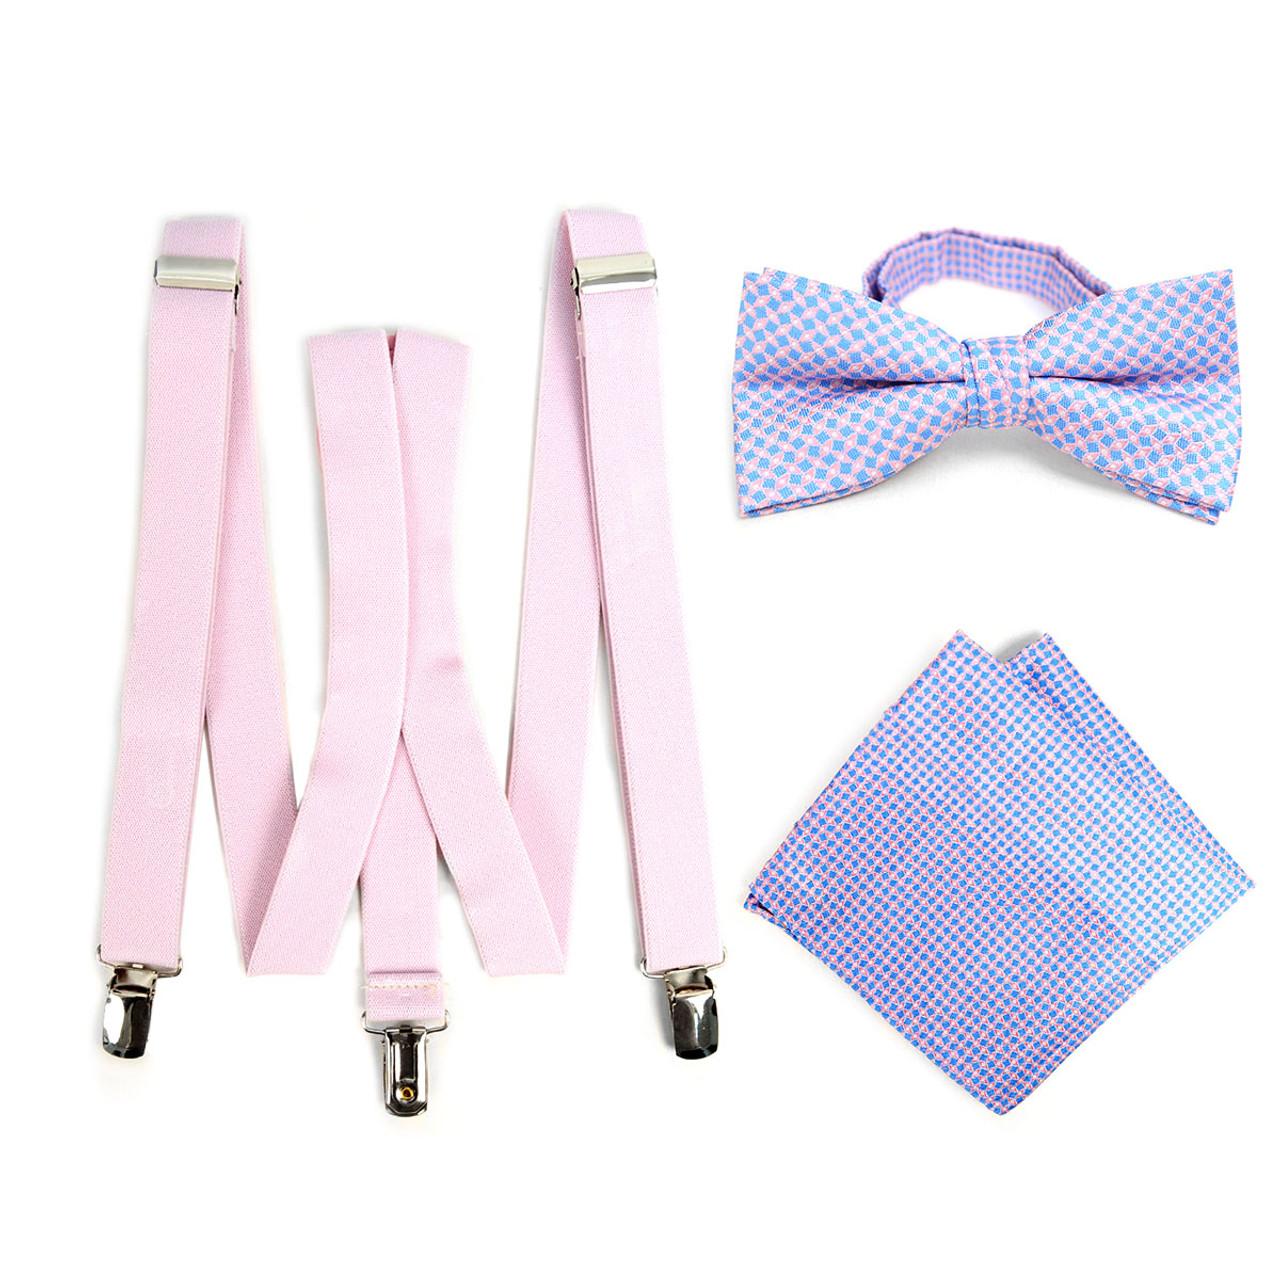 4b82549961d1 3pc Men's Pink Clip-on Suspenders, Dots Bow Tie & Hanky Sets - FYBTHSU-PK#2